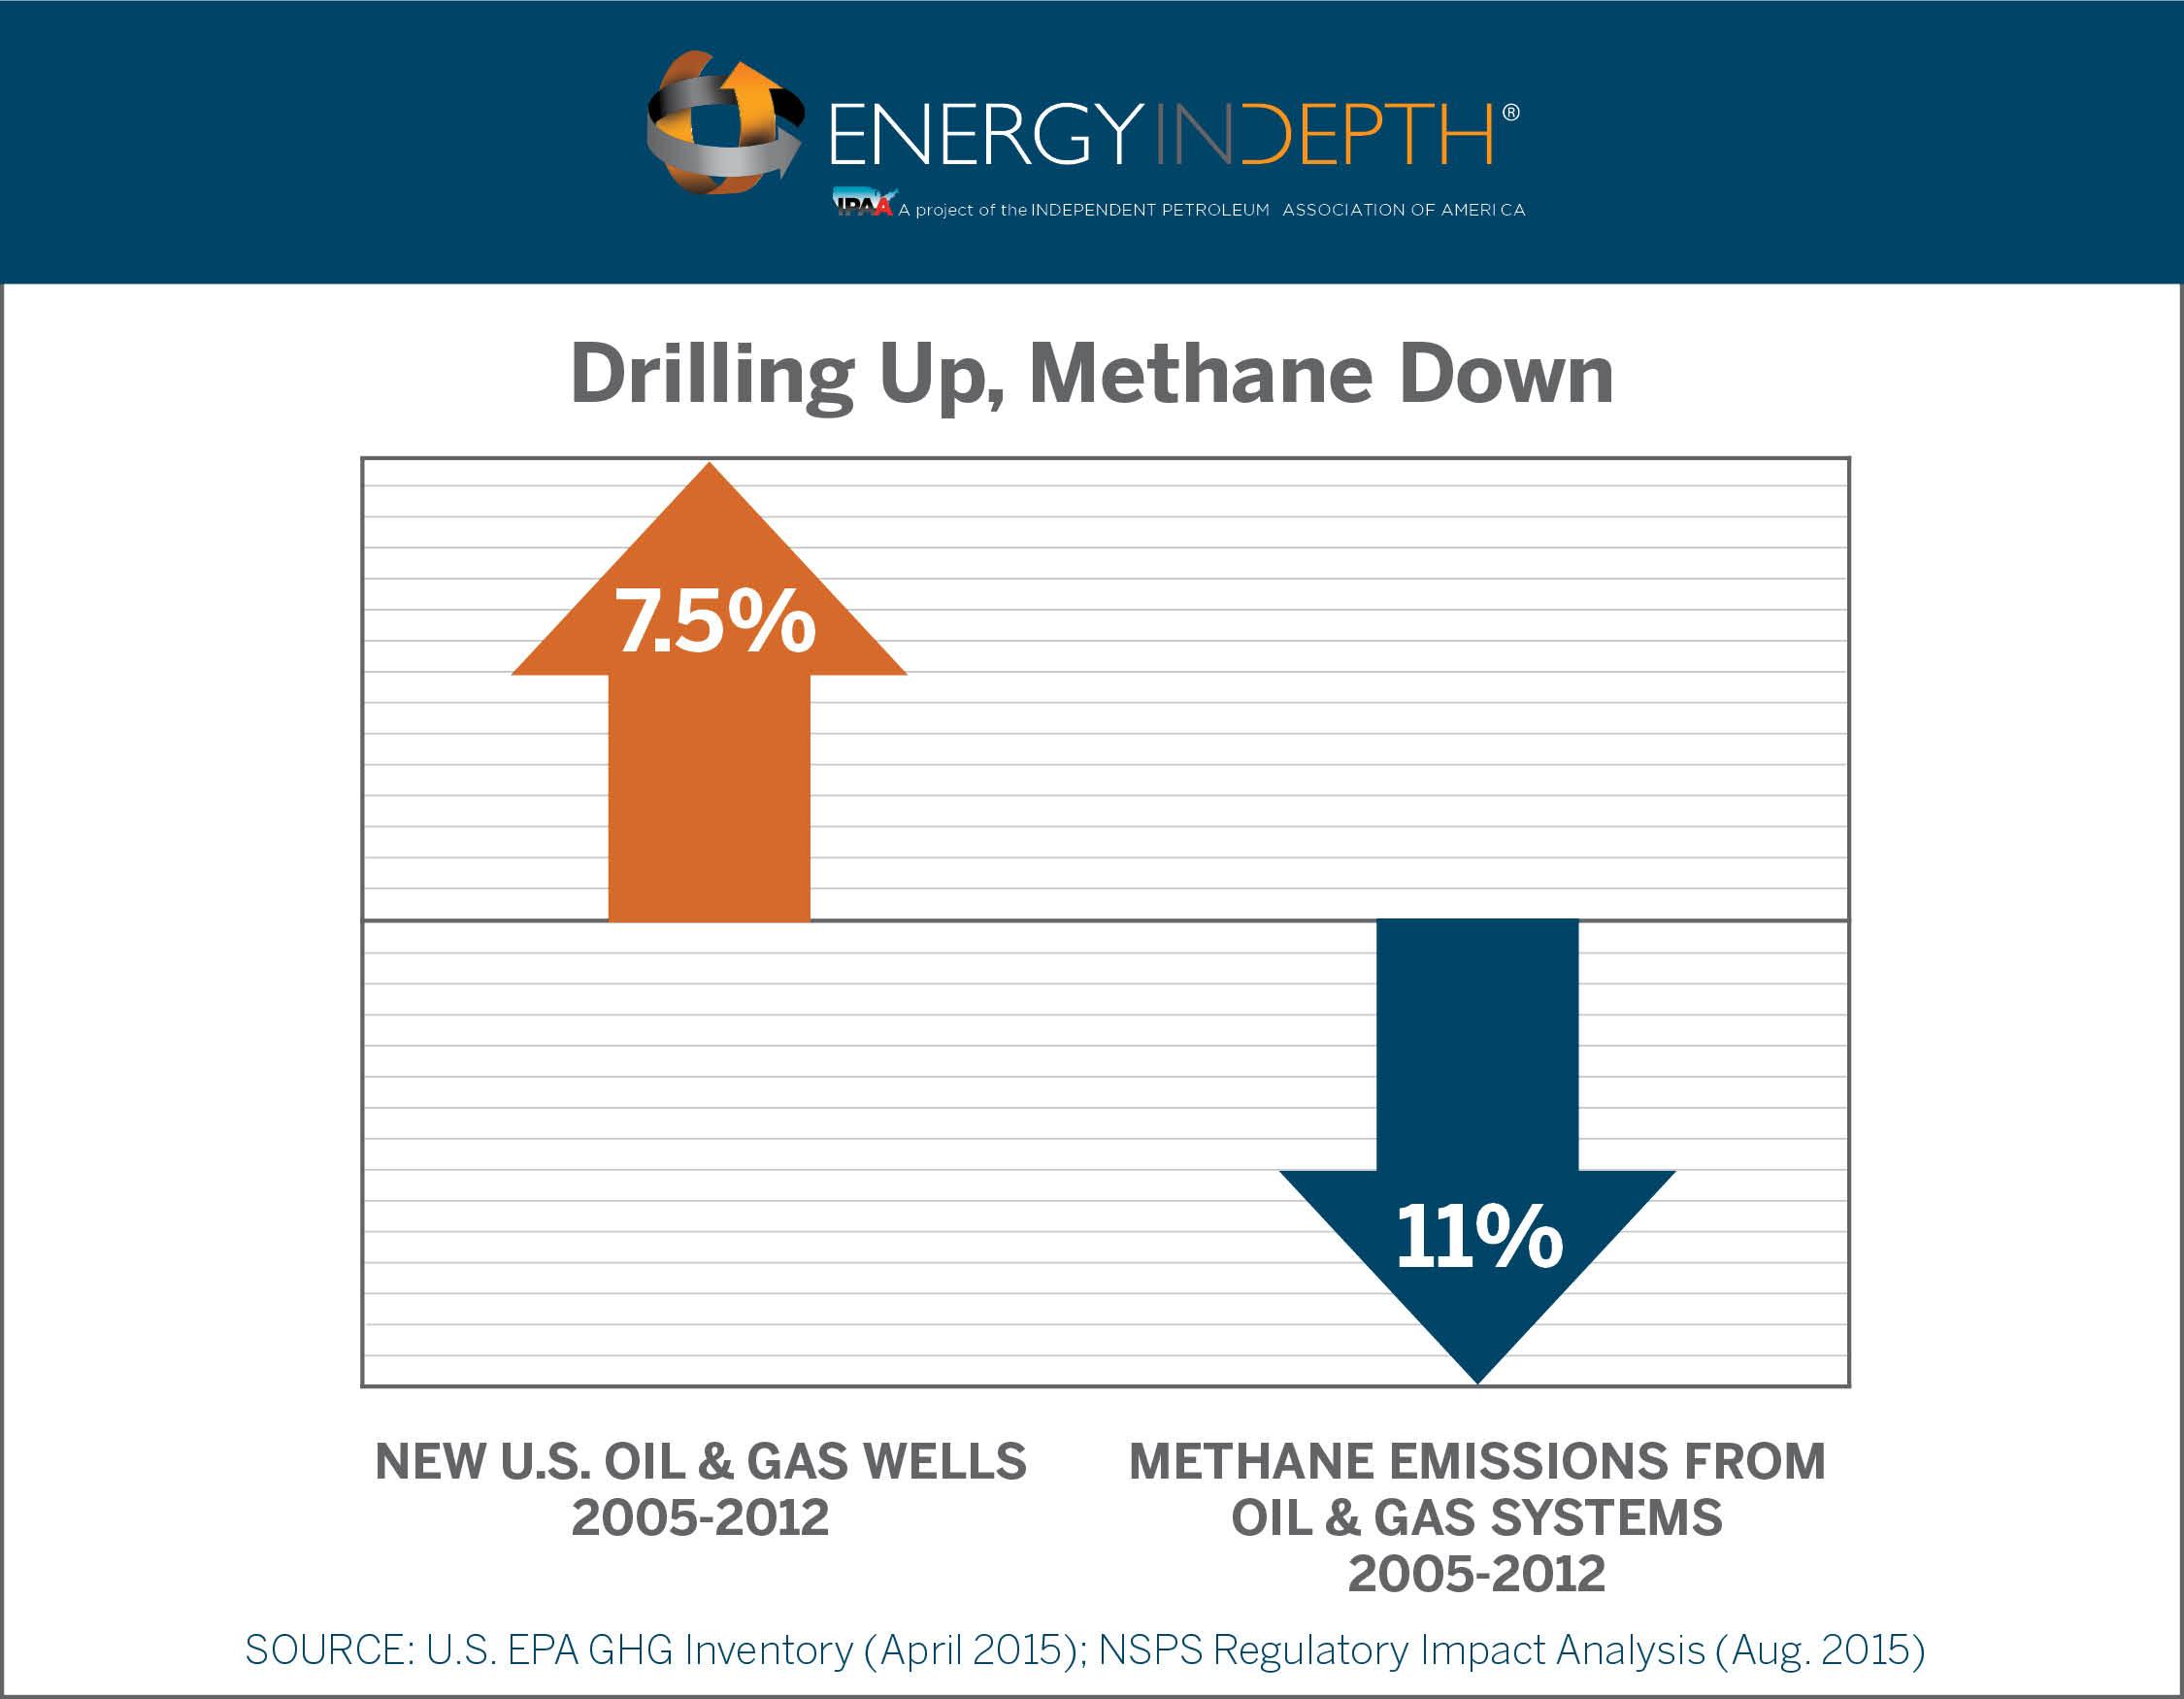 New EPA Methane Regulations Based on Flawed Emissions Assumptions